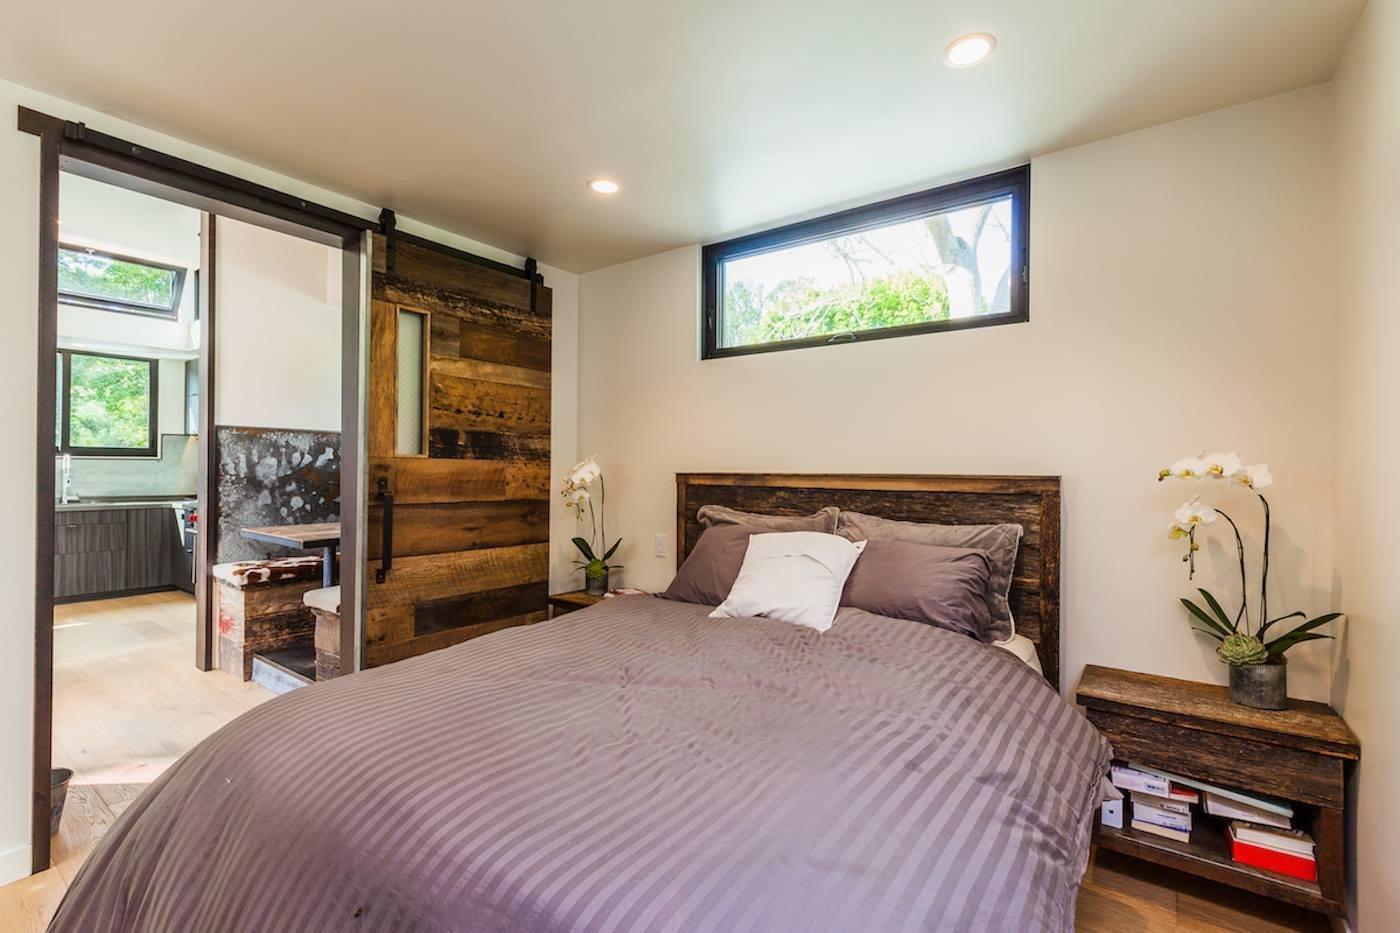 Bedroom, Bed, Night Stands, Light Hardwood Floor, and Ceiling Lighting Reclaimed Steel and Wood Barn Doors  Reclaimed Malibu Modern Beach Retreat